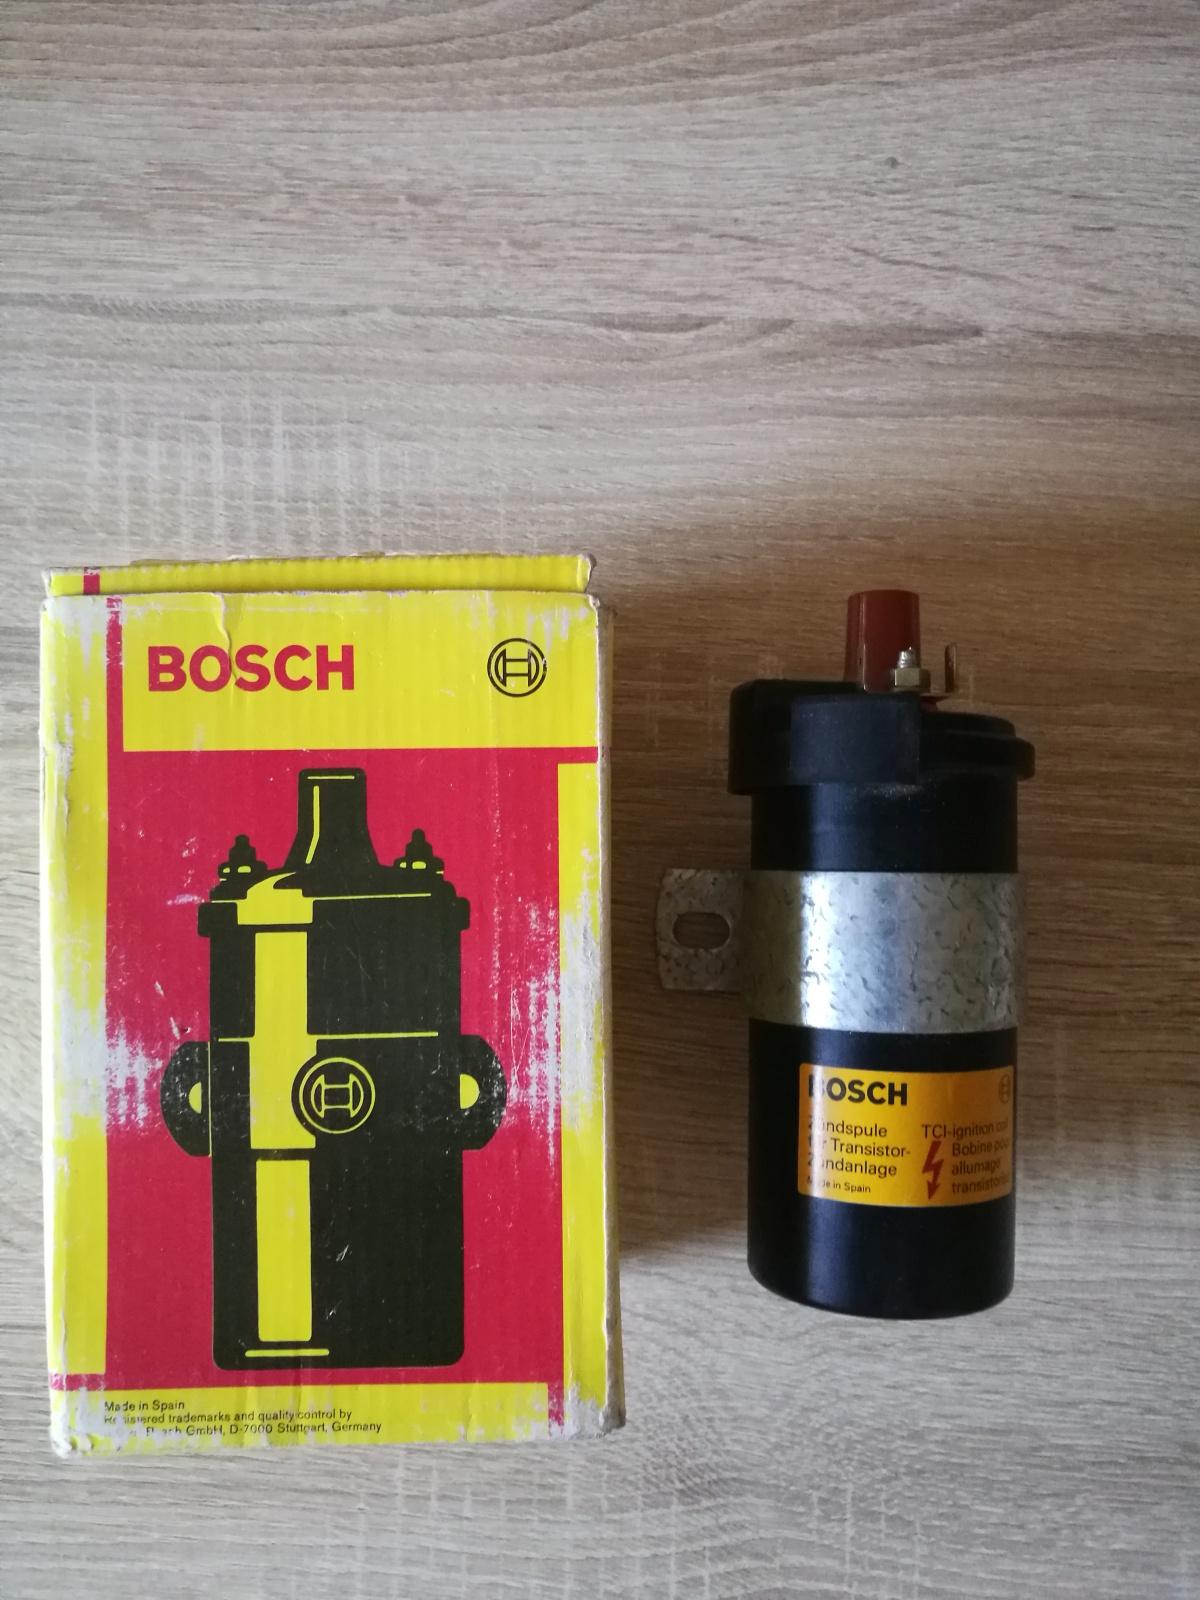 Bosch Zündspule 12 Volt 1220522011 bobina de encendido bobine d'allumage igniti